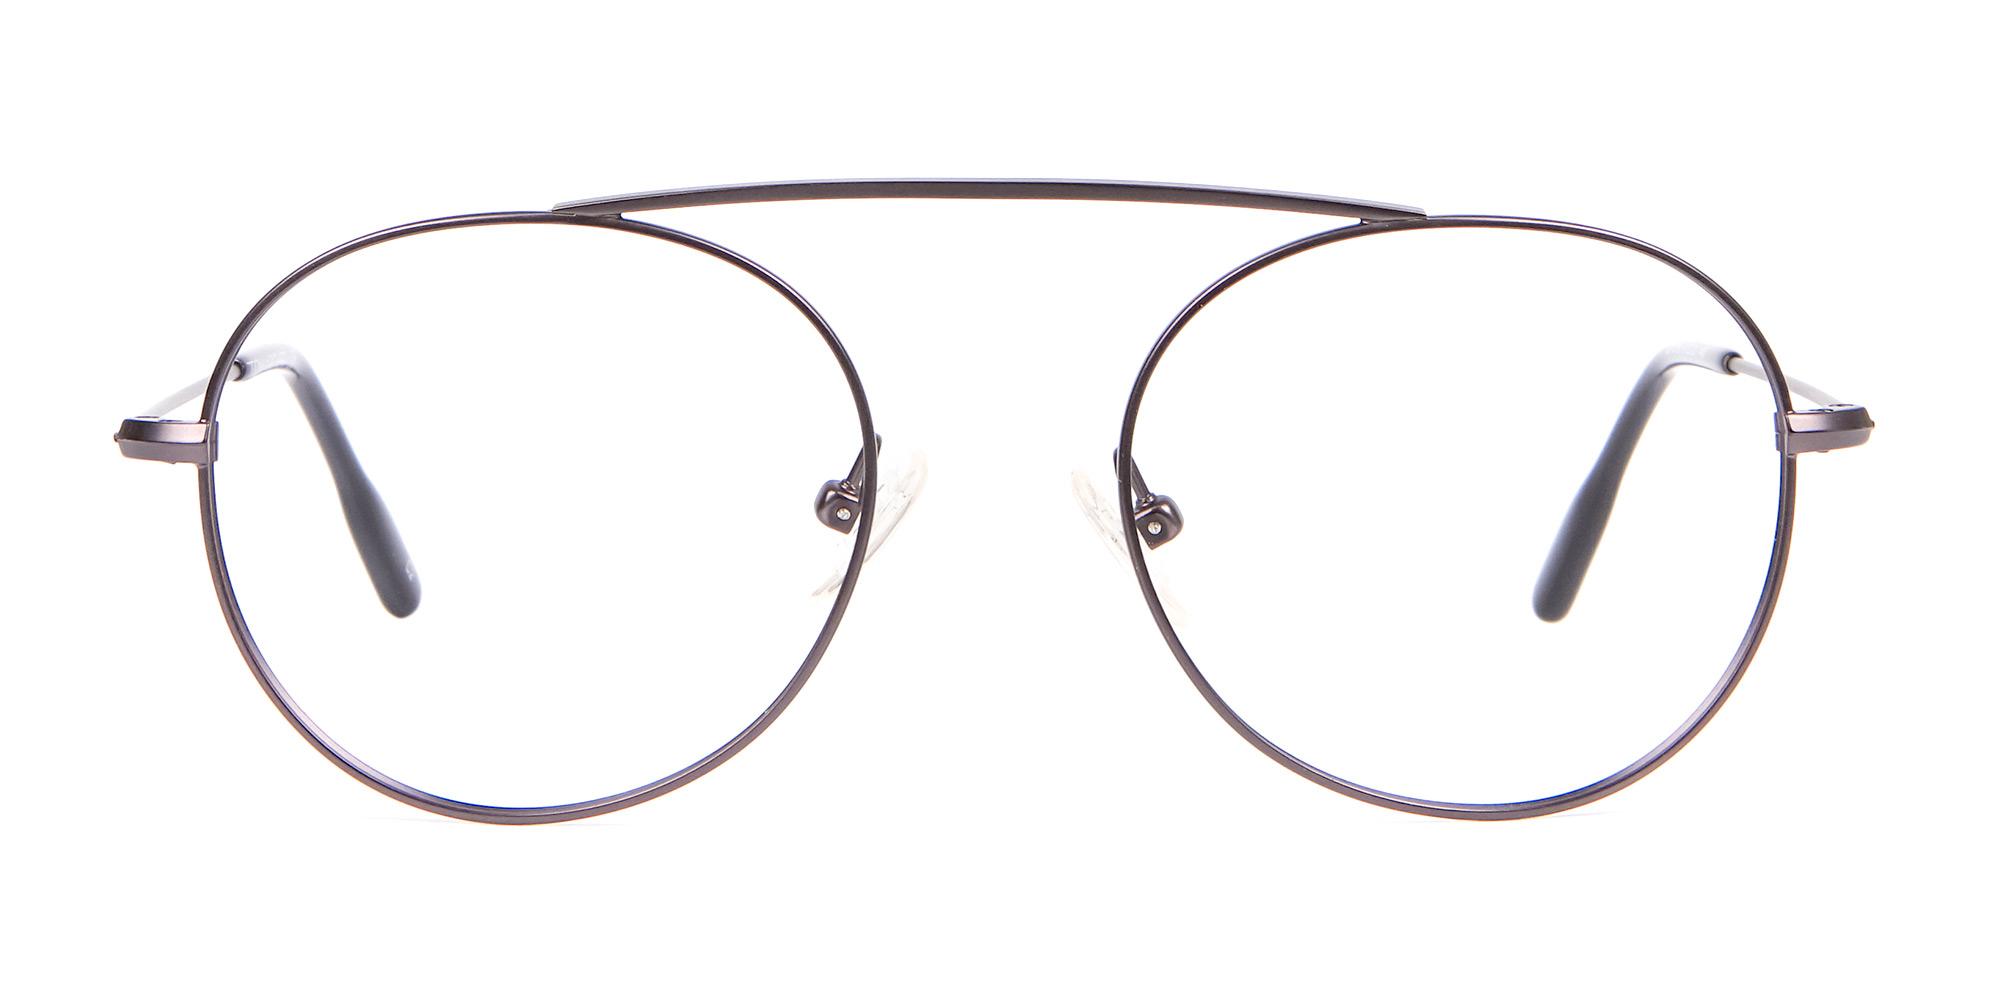 Dark Gunmetal No Bridge Glasses